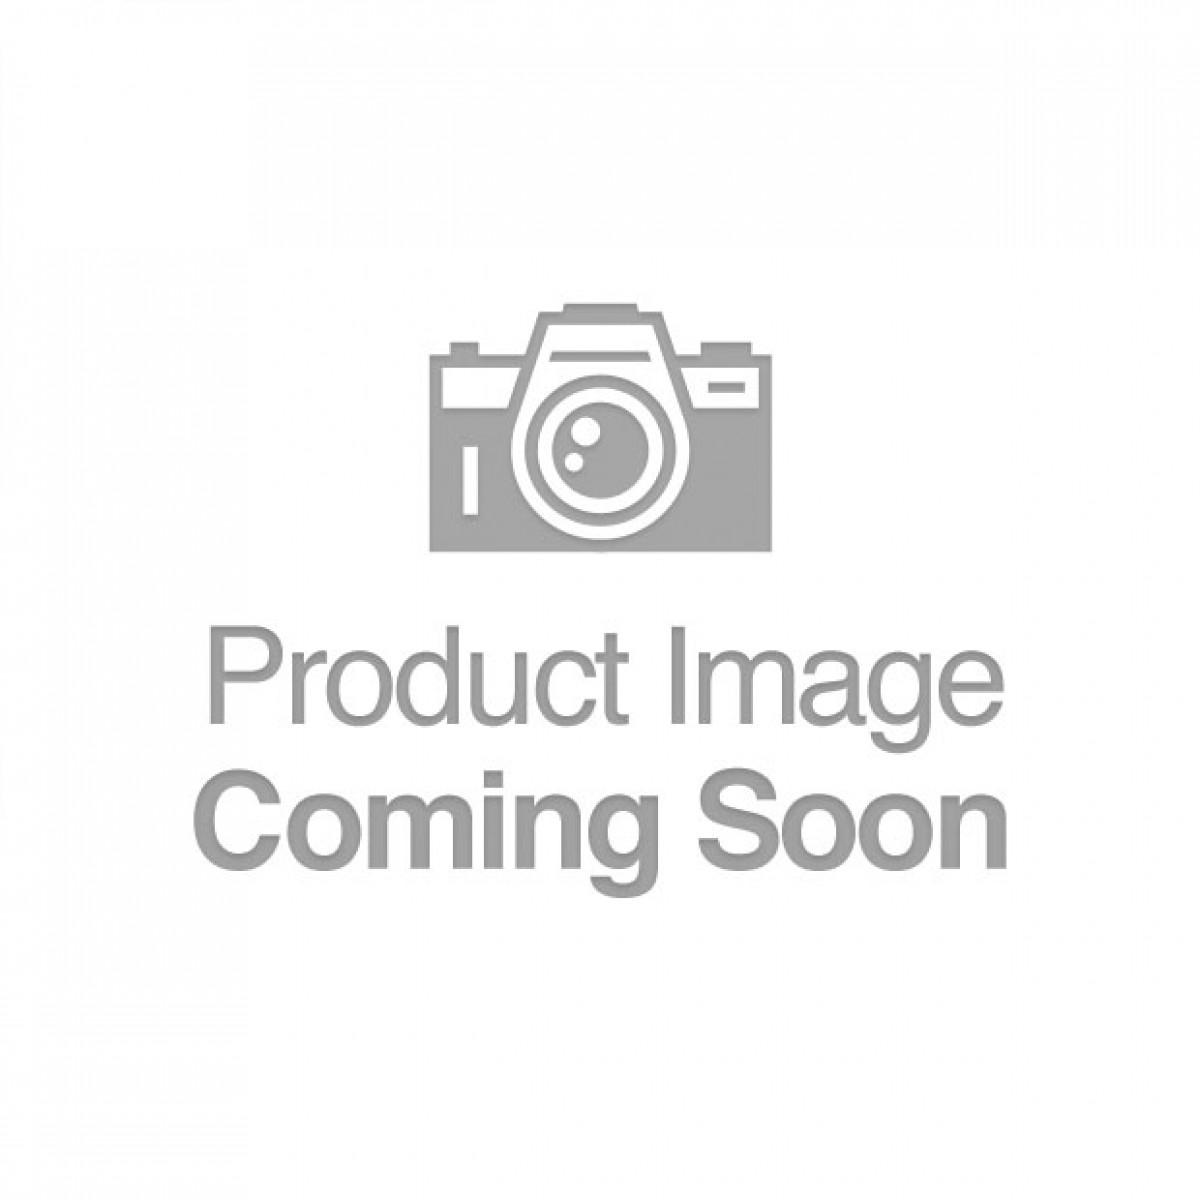 Id Millennium Silicone Lubricant - 17 Oz  Pump Bottle